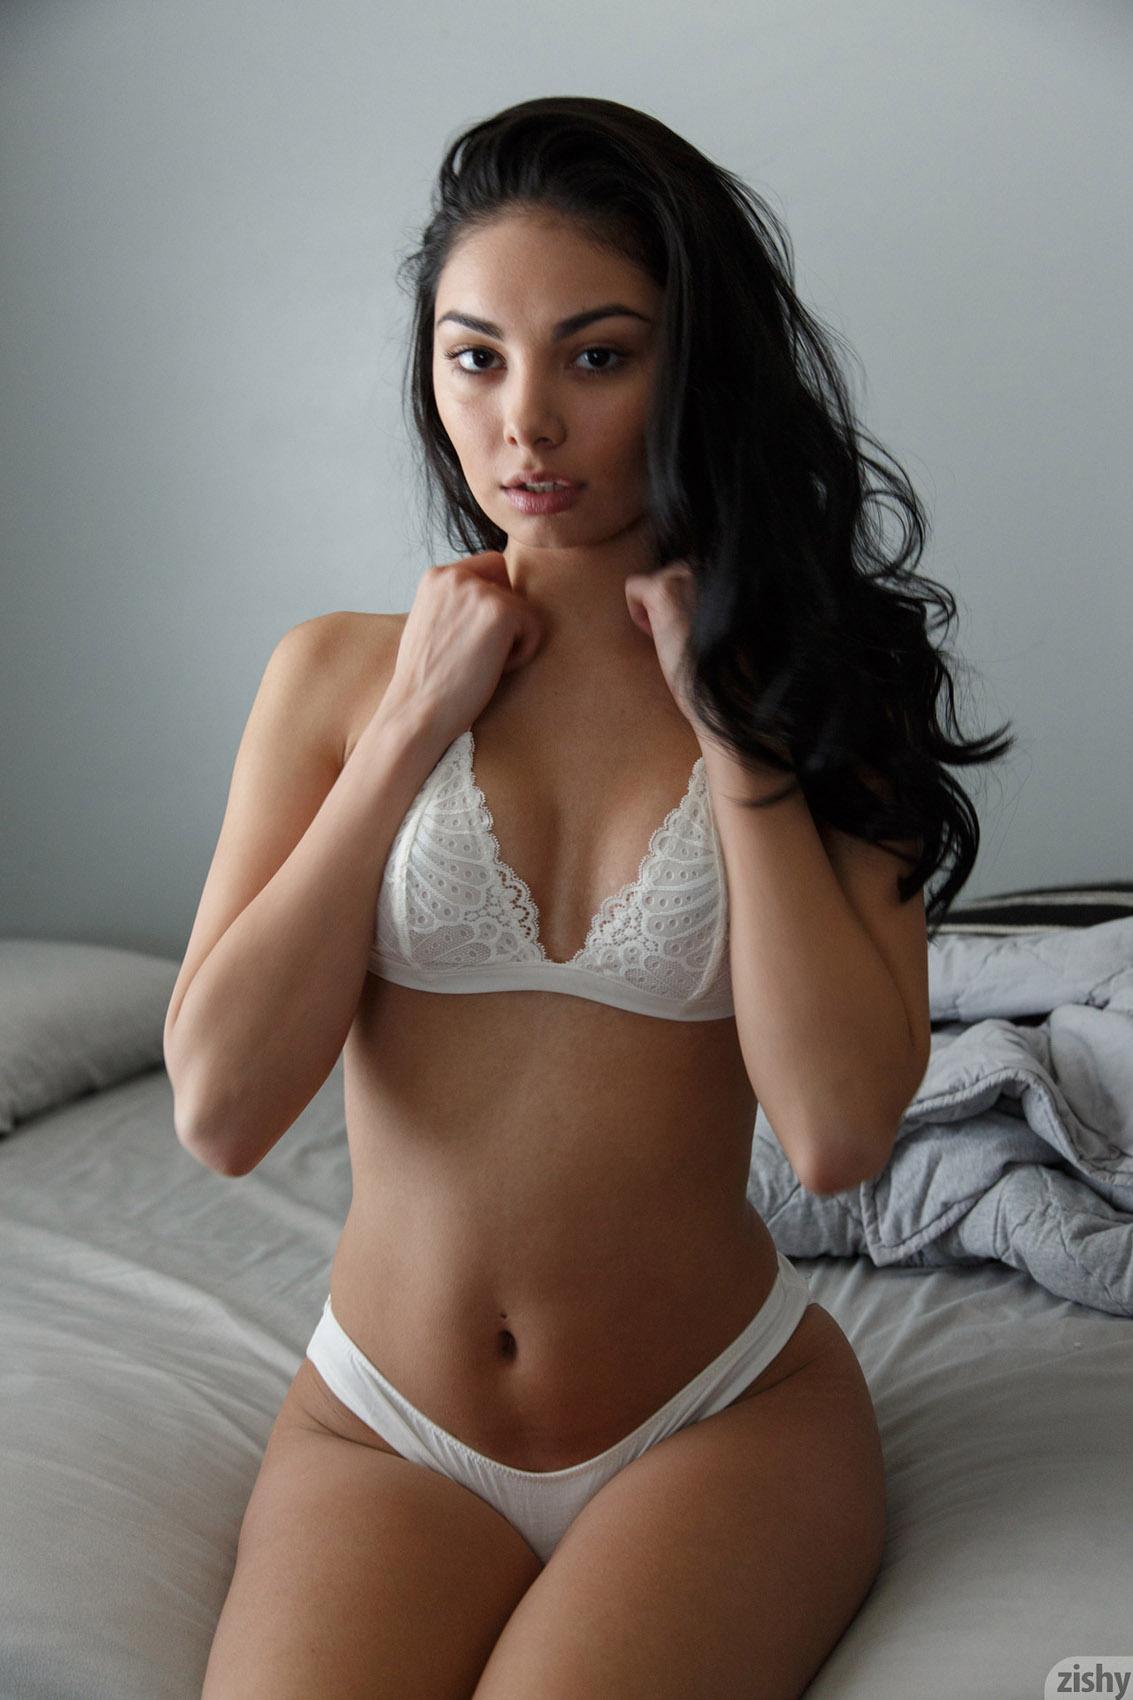 Sexy women big leg naked spread pussy